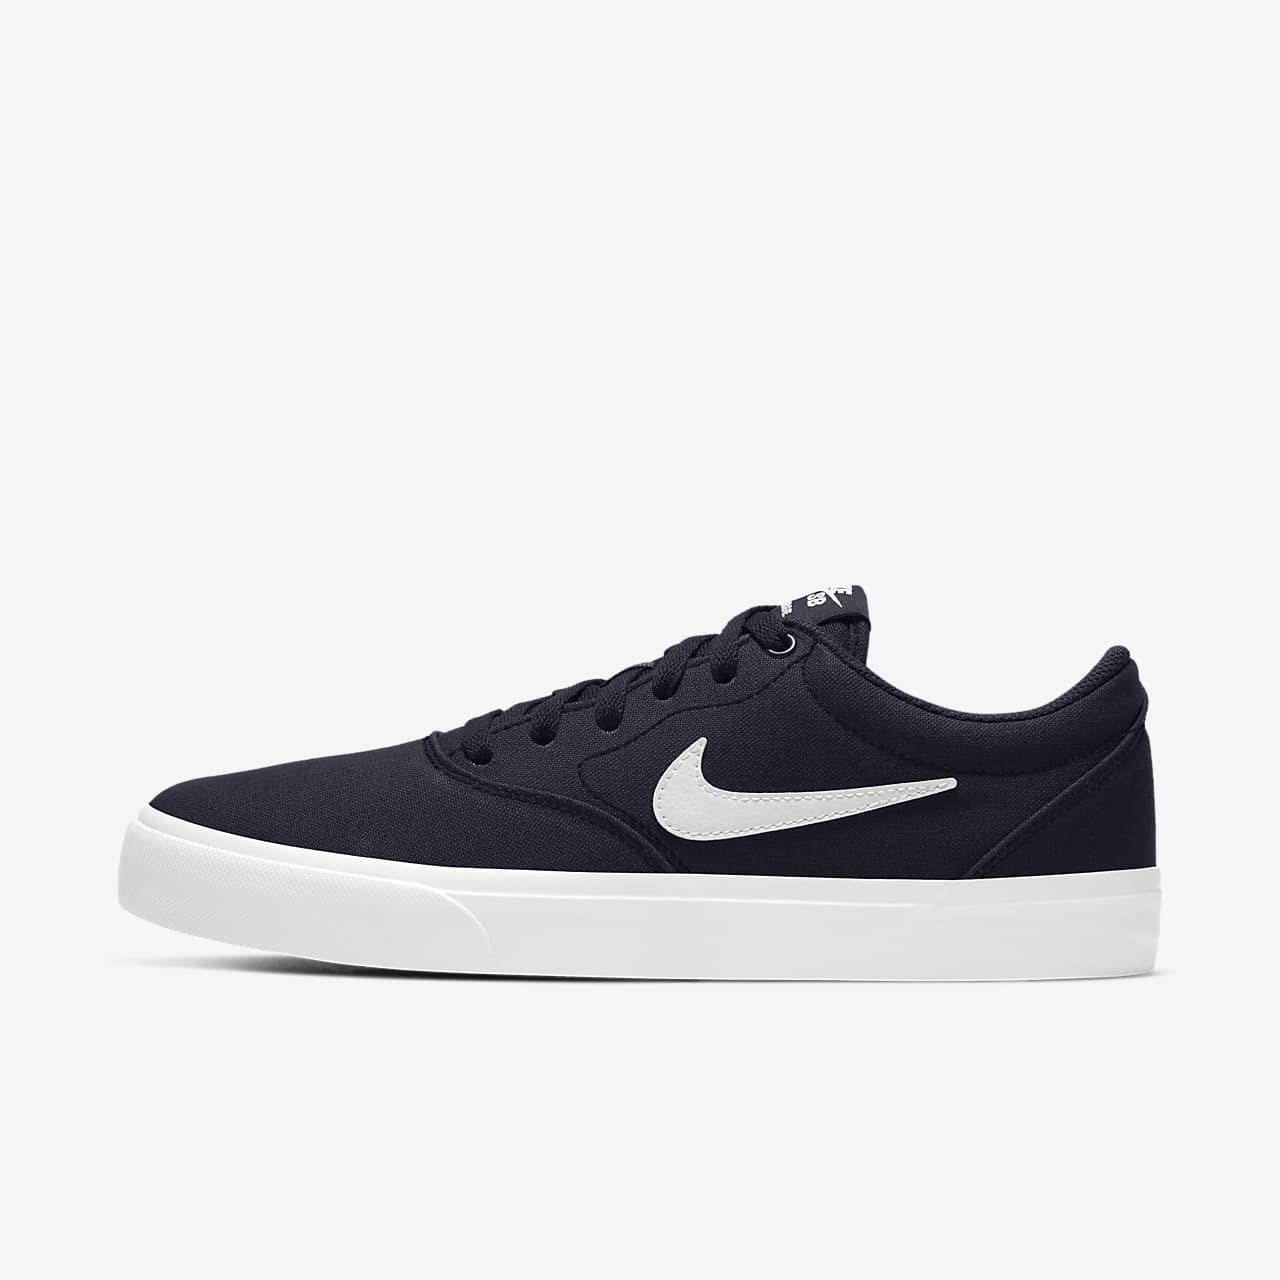 Chaussure de skateboard Nike SB Charge Canvas pour Homme